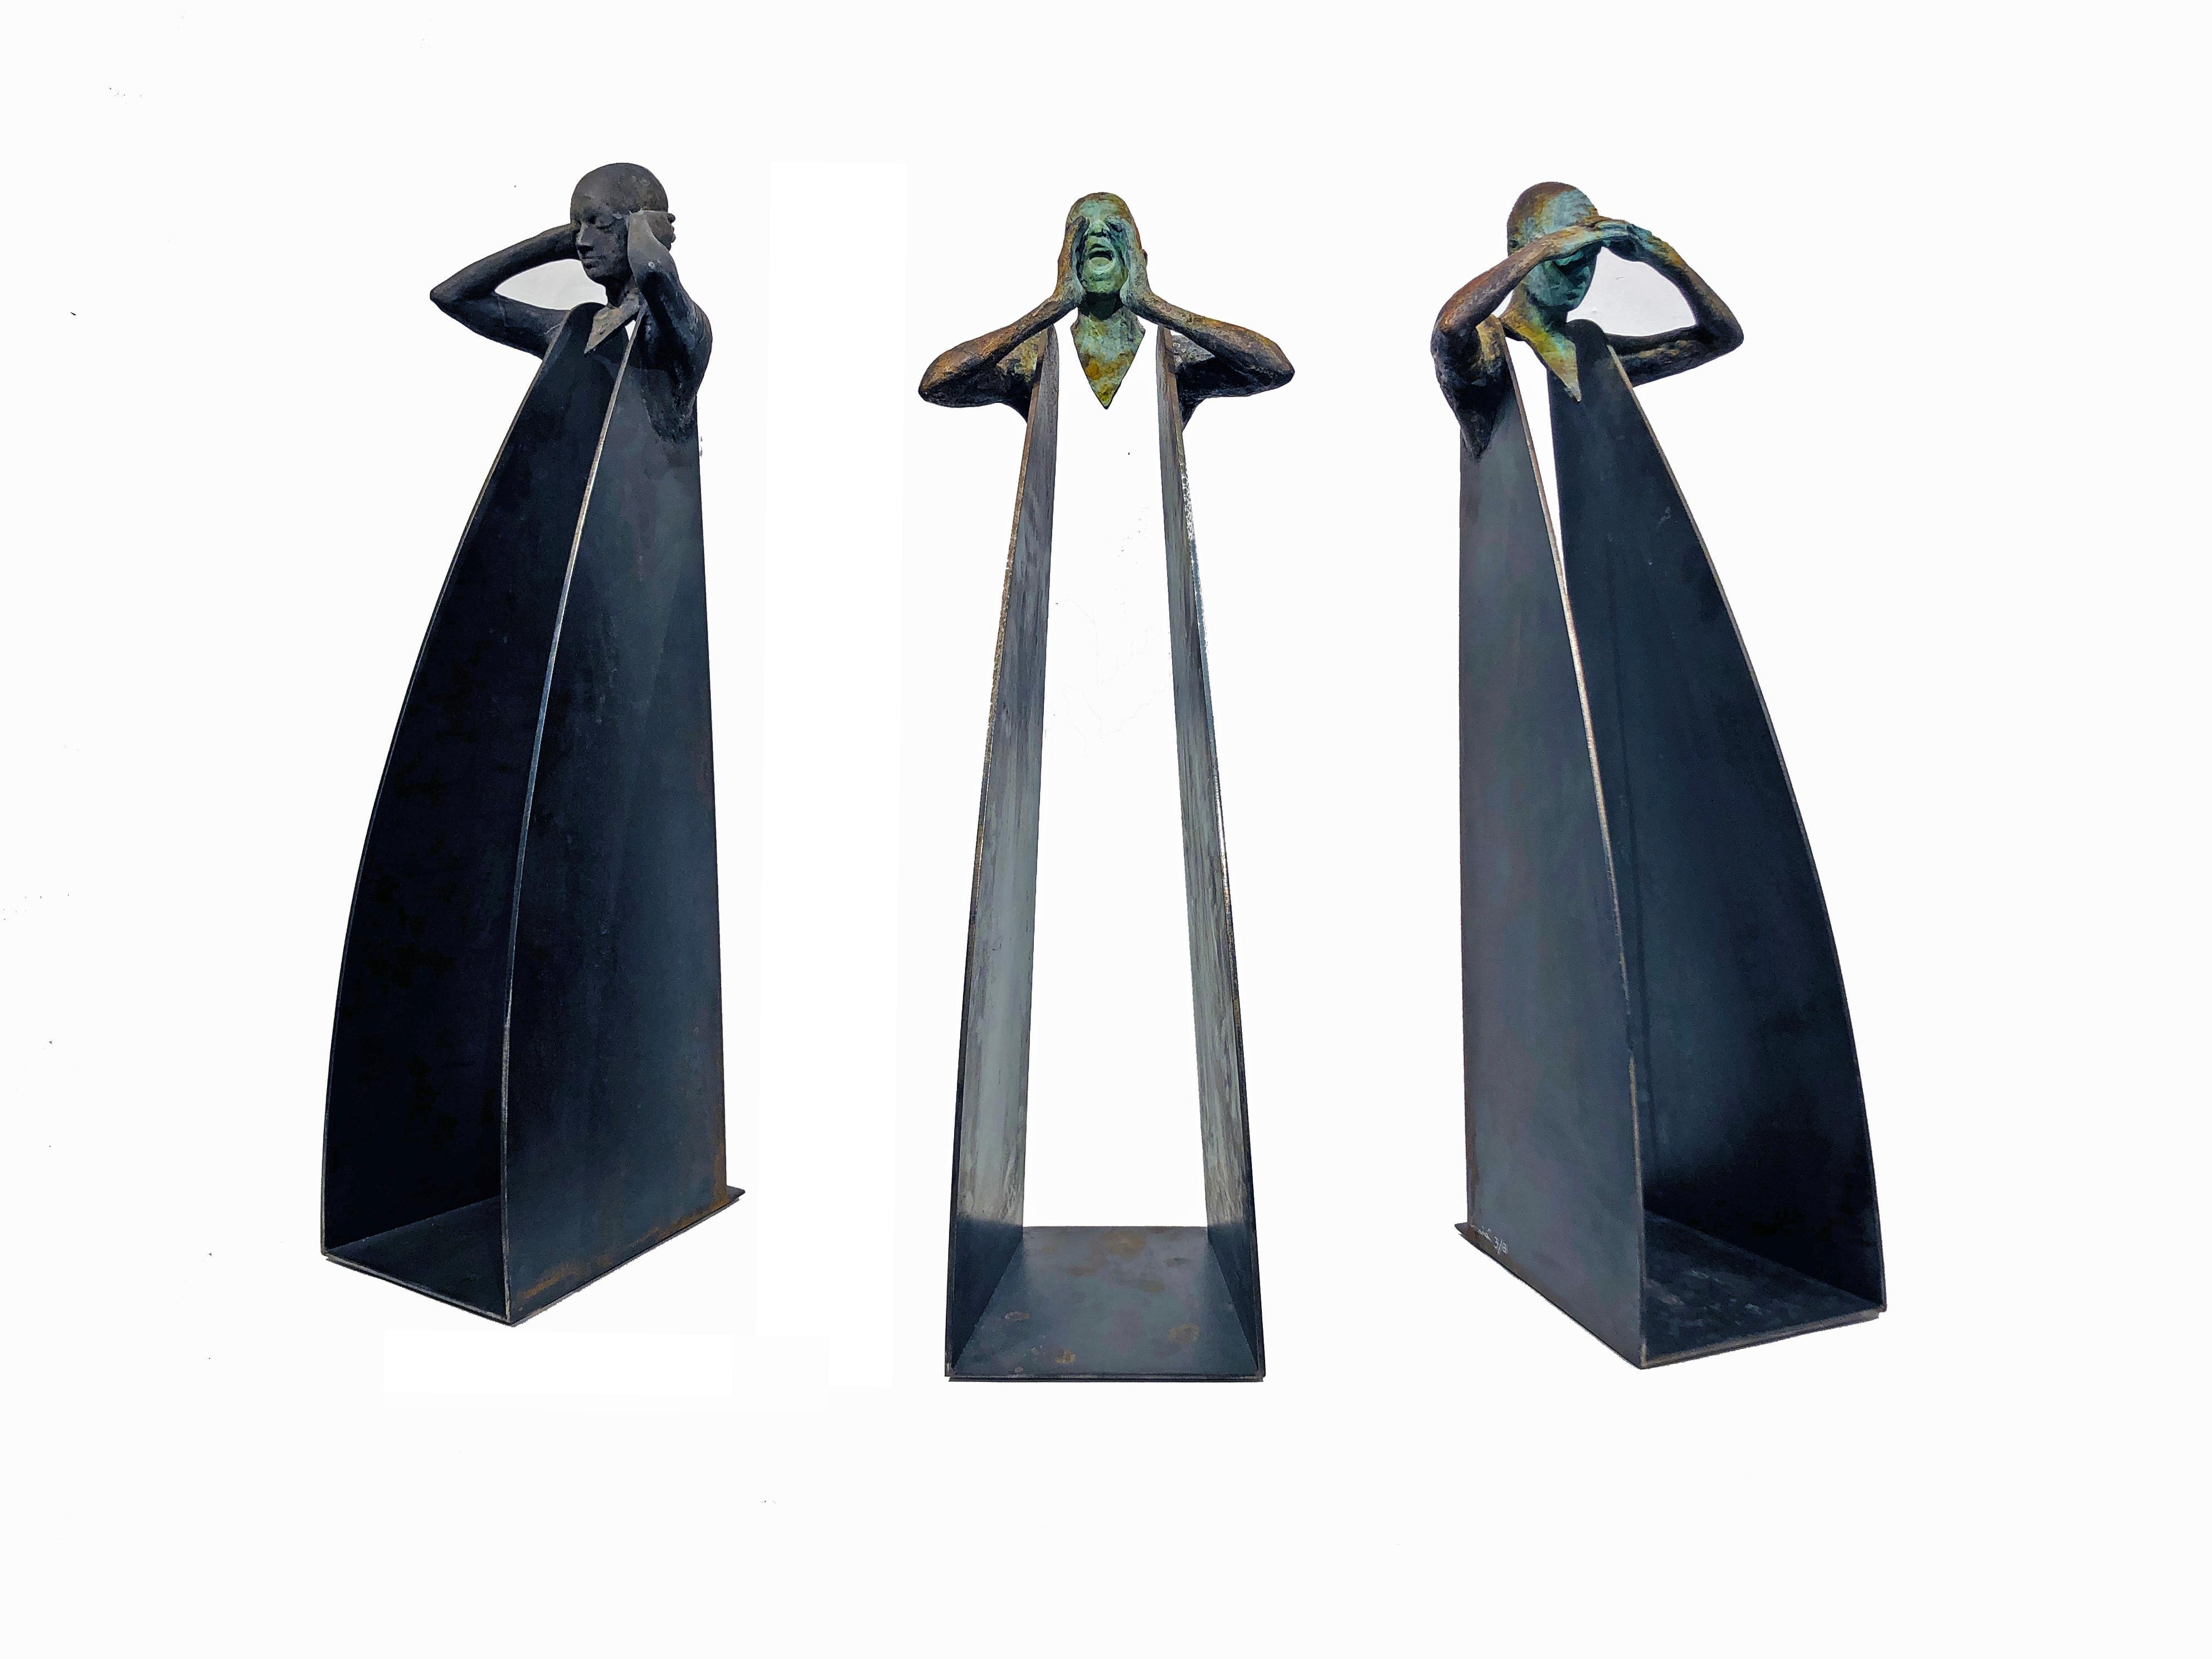 Horizonte Grito Sordo - Three Figural Contemporary Bronze and Steel Sculptures